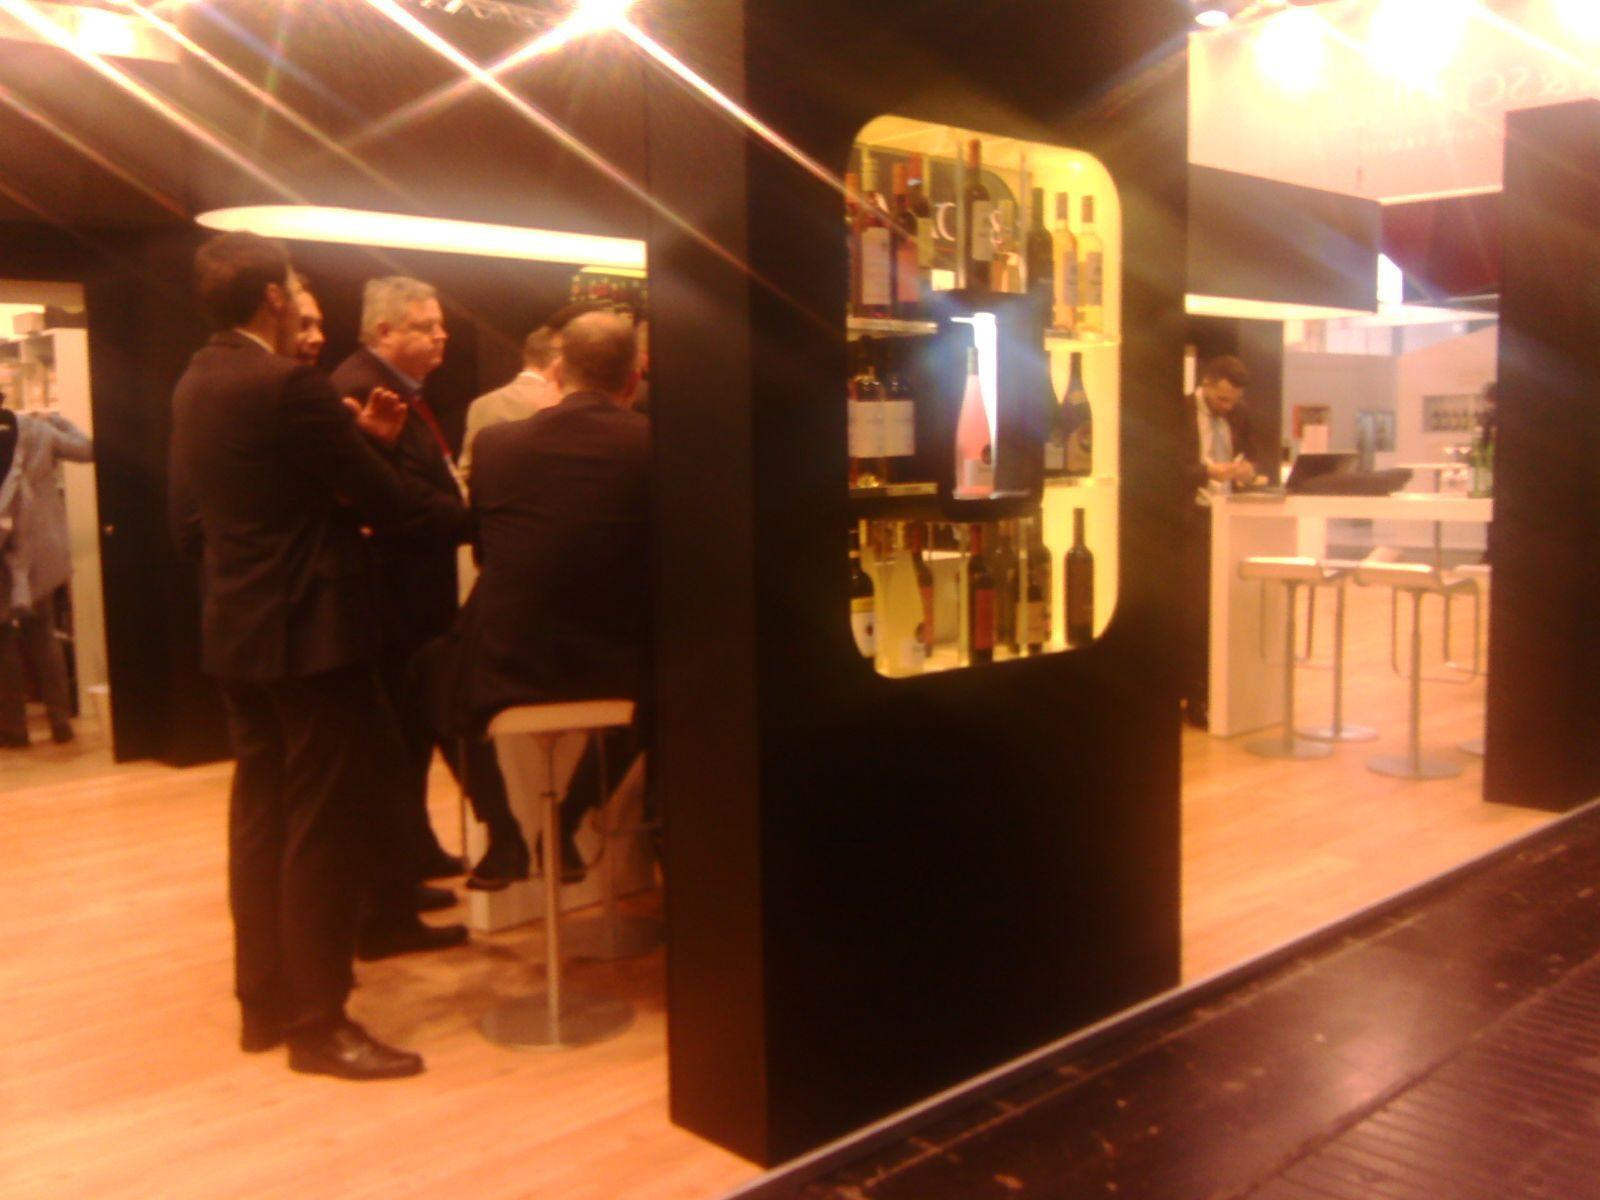 prowein-feria-vinos-internacional-jamon-iberico-jamones simeon-4